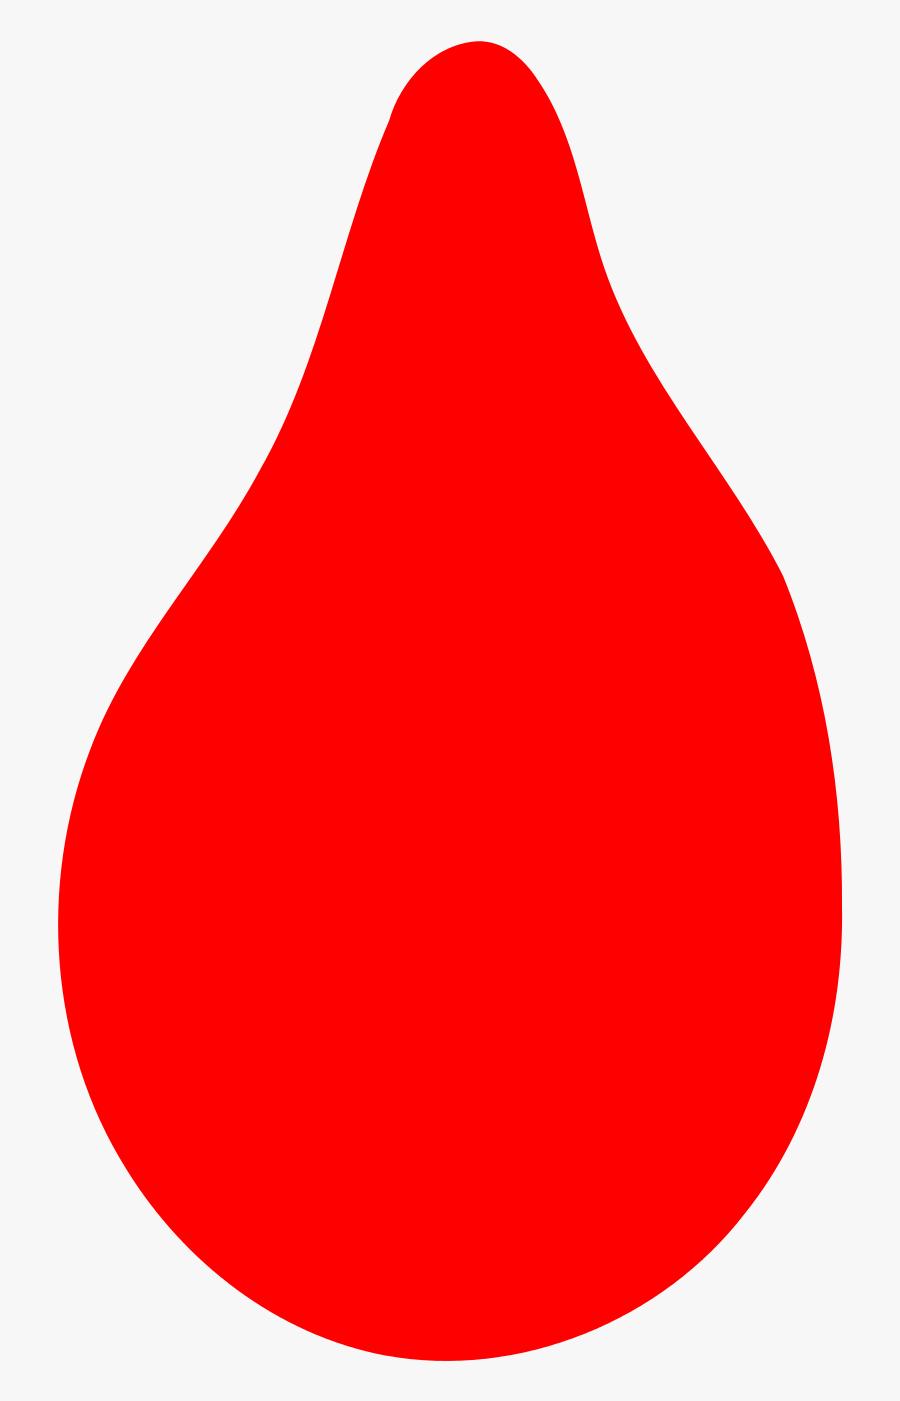 Drop Of Hot Sauce Clipart , Png Download - Drop Of Hot Sauce, Transparent Clipart